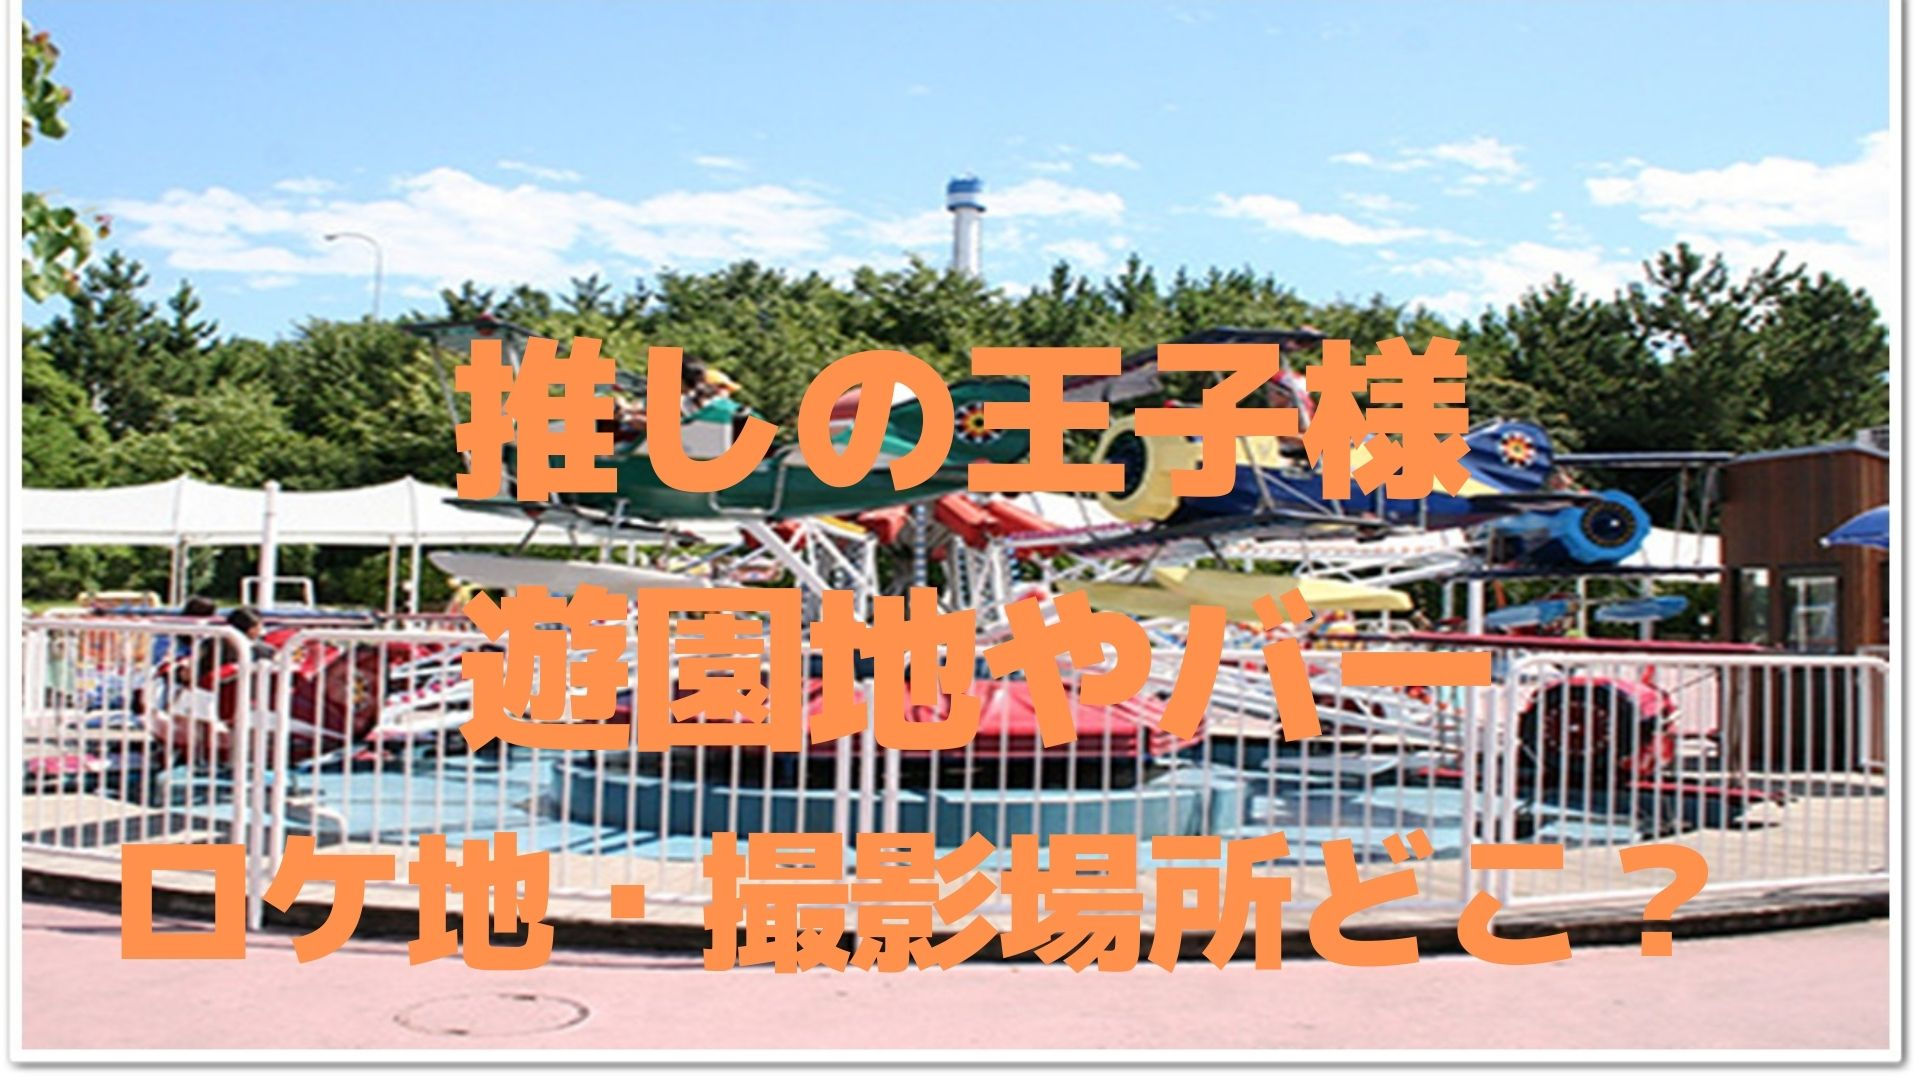 oshi-no-oujisama-location